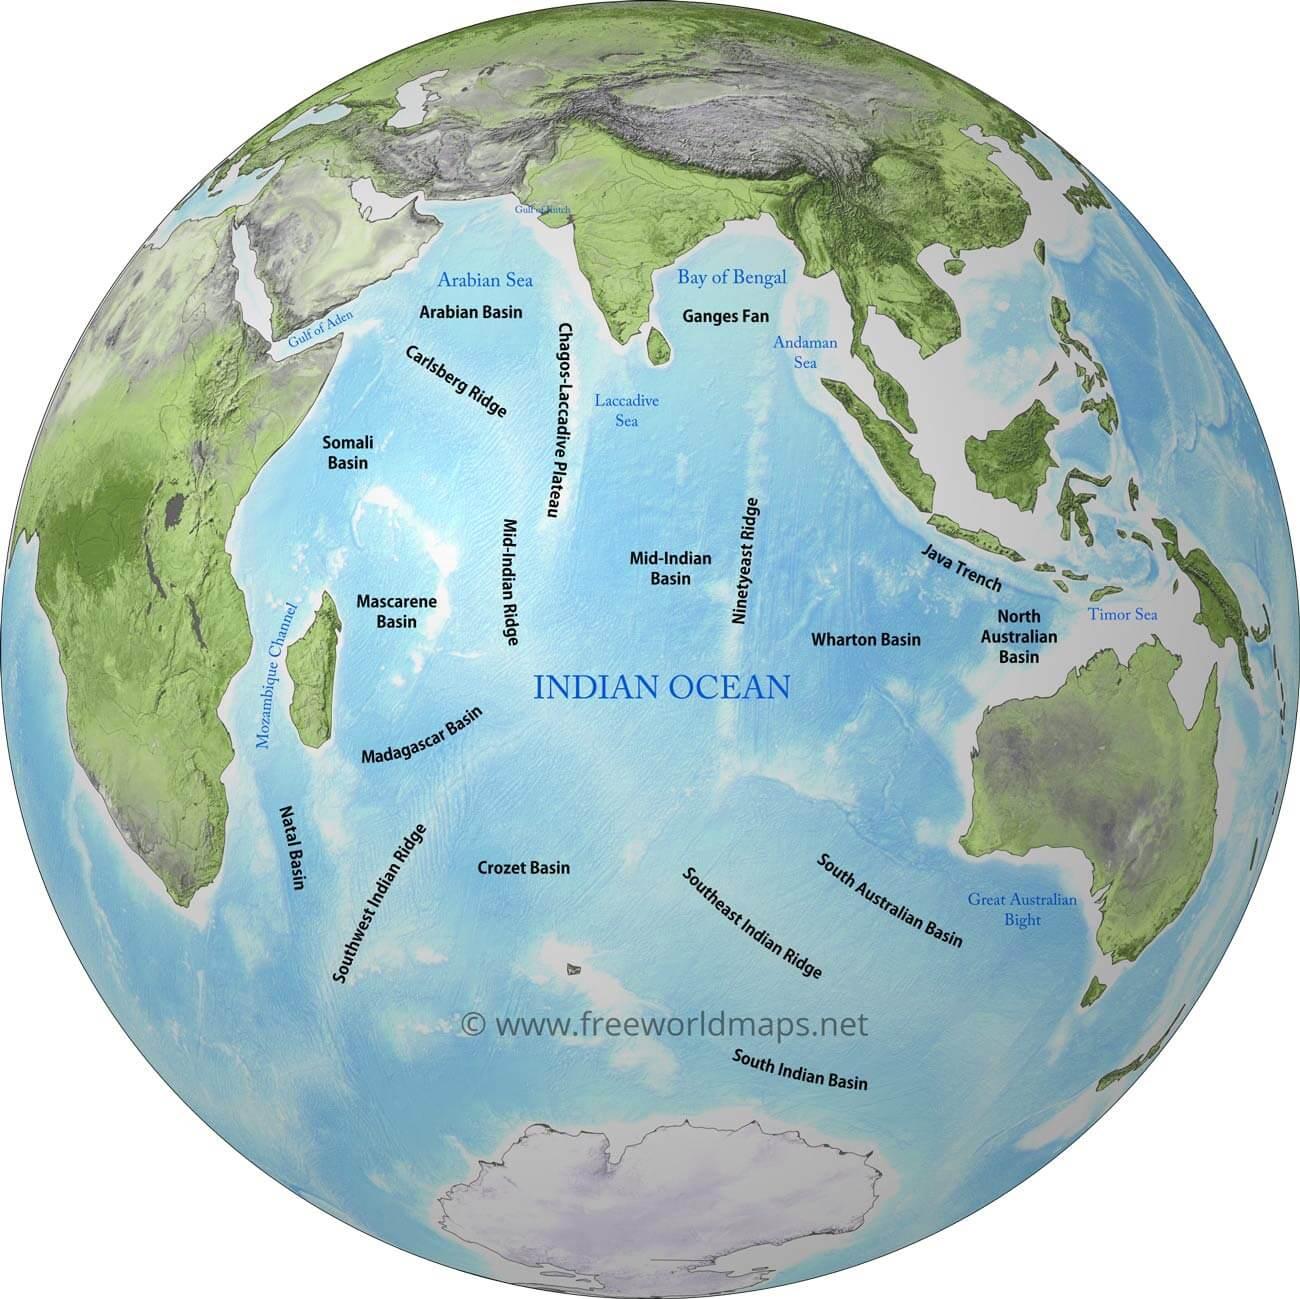 Chagos Laccadive Ridge Jordskaelv Og Tsunamier